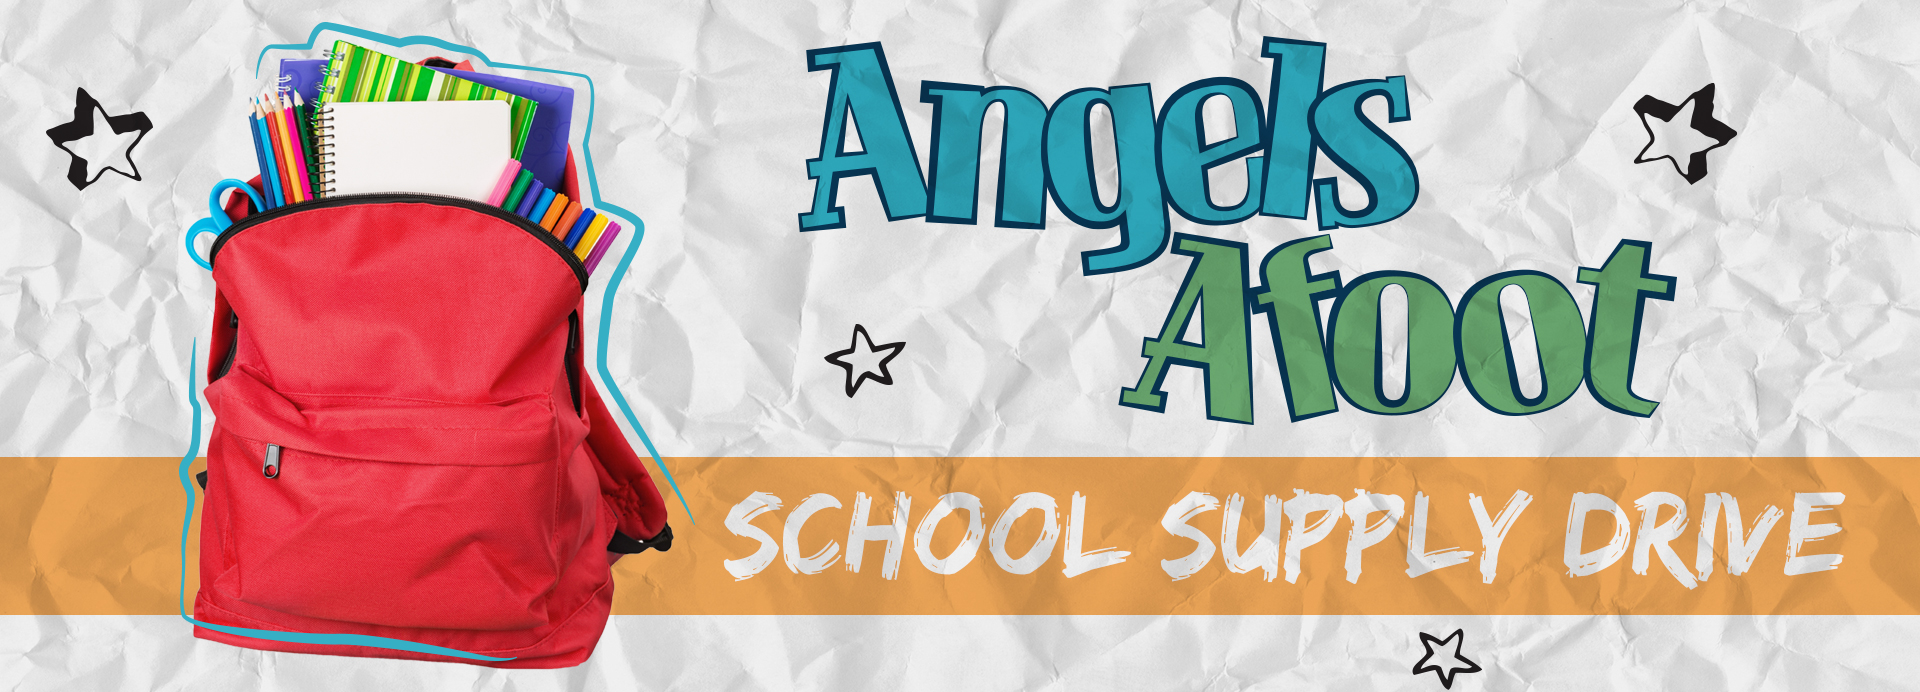 AngelsAfoot_SchoolSupplyDrive_1920x692.jpg